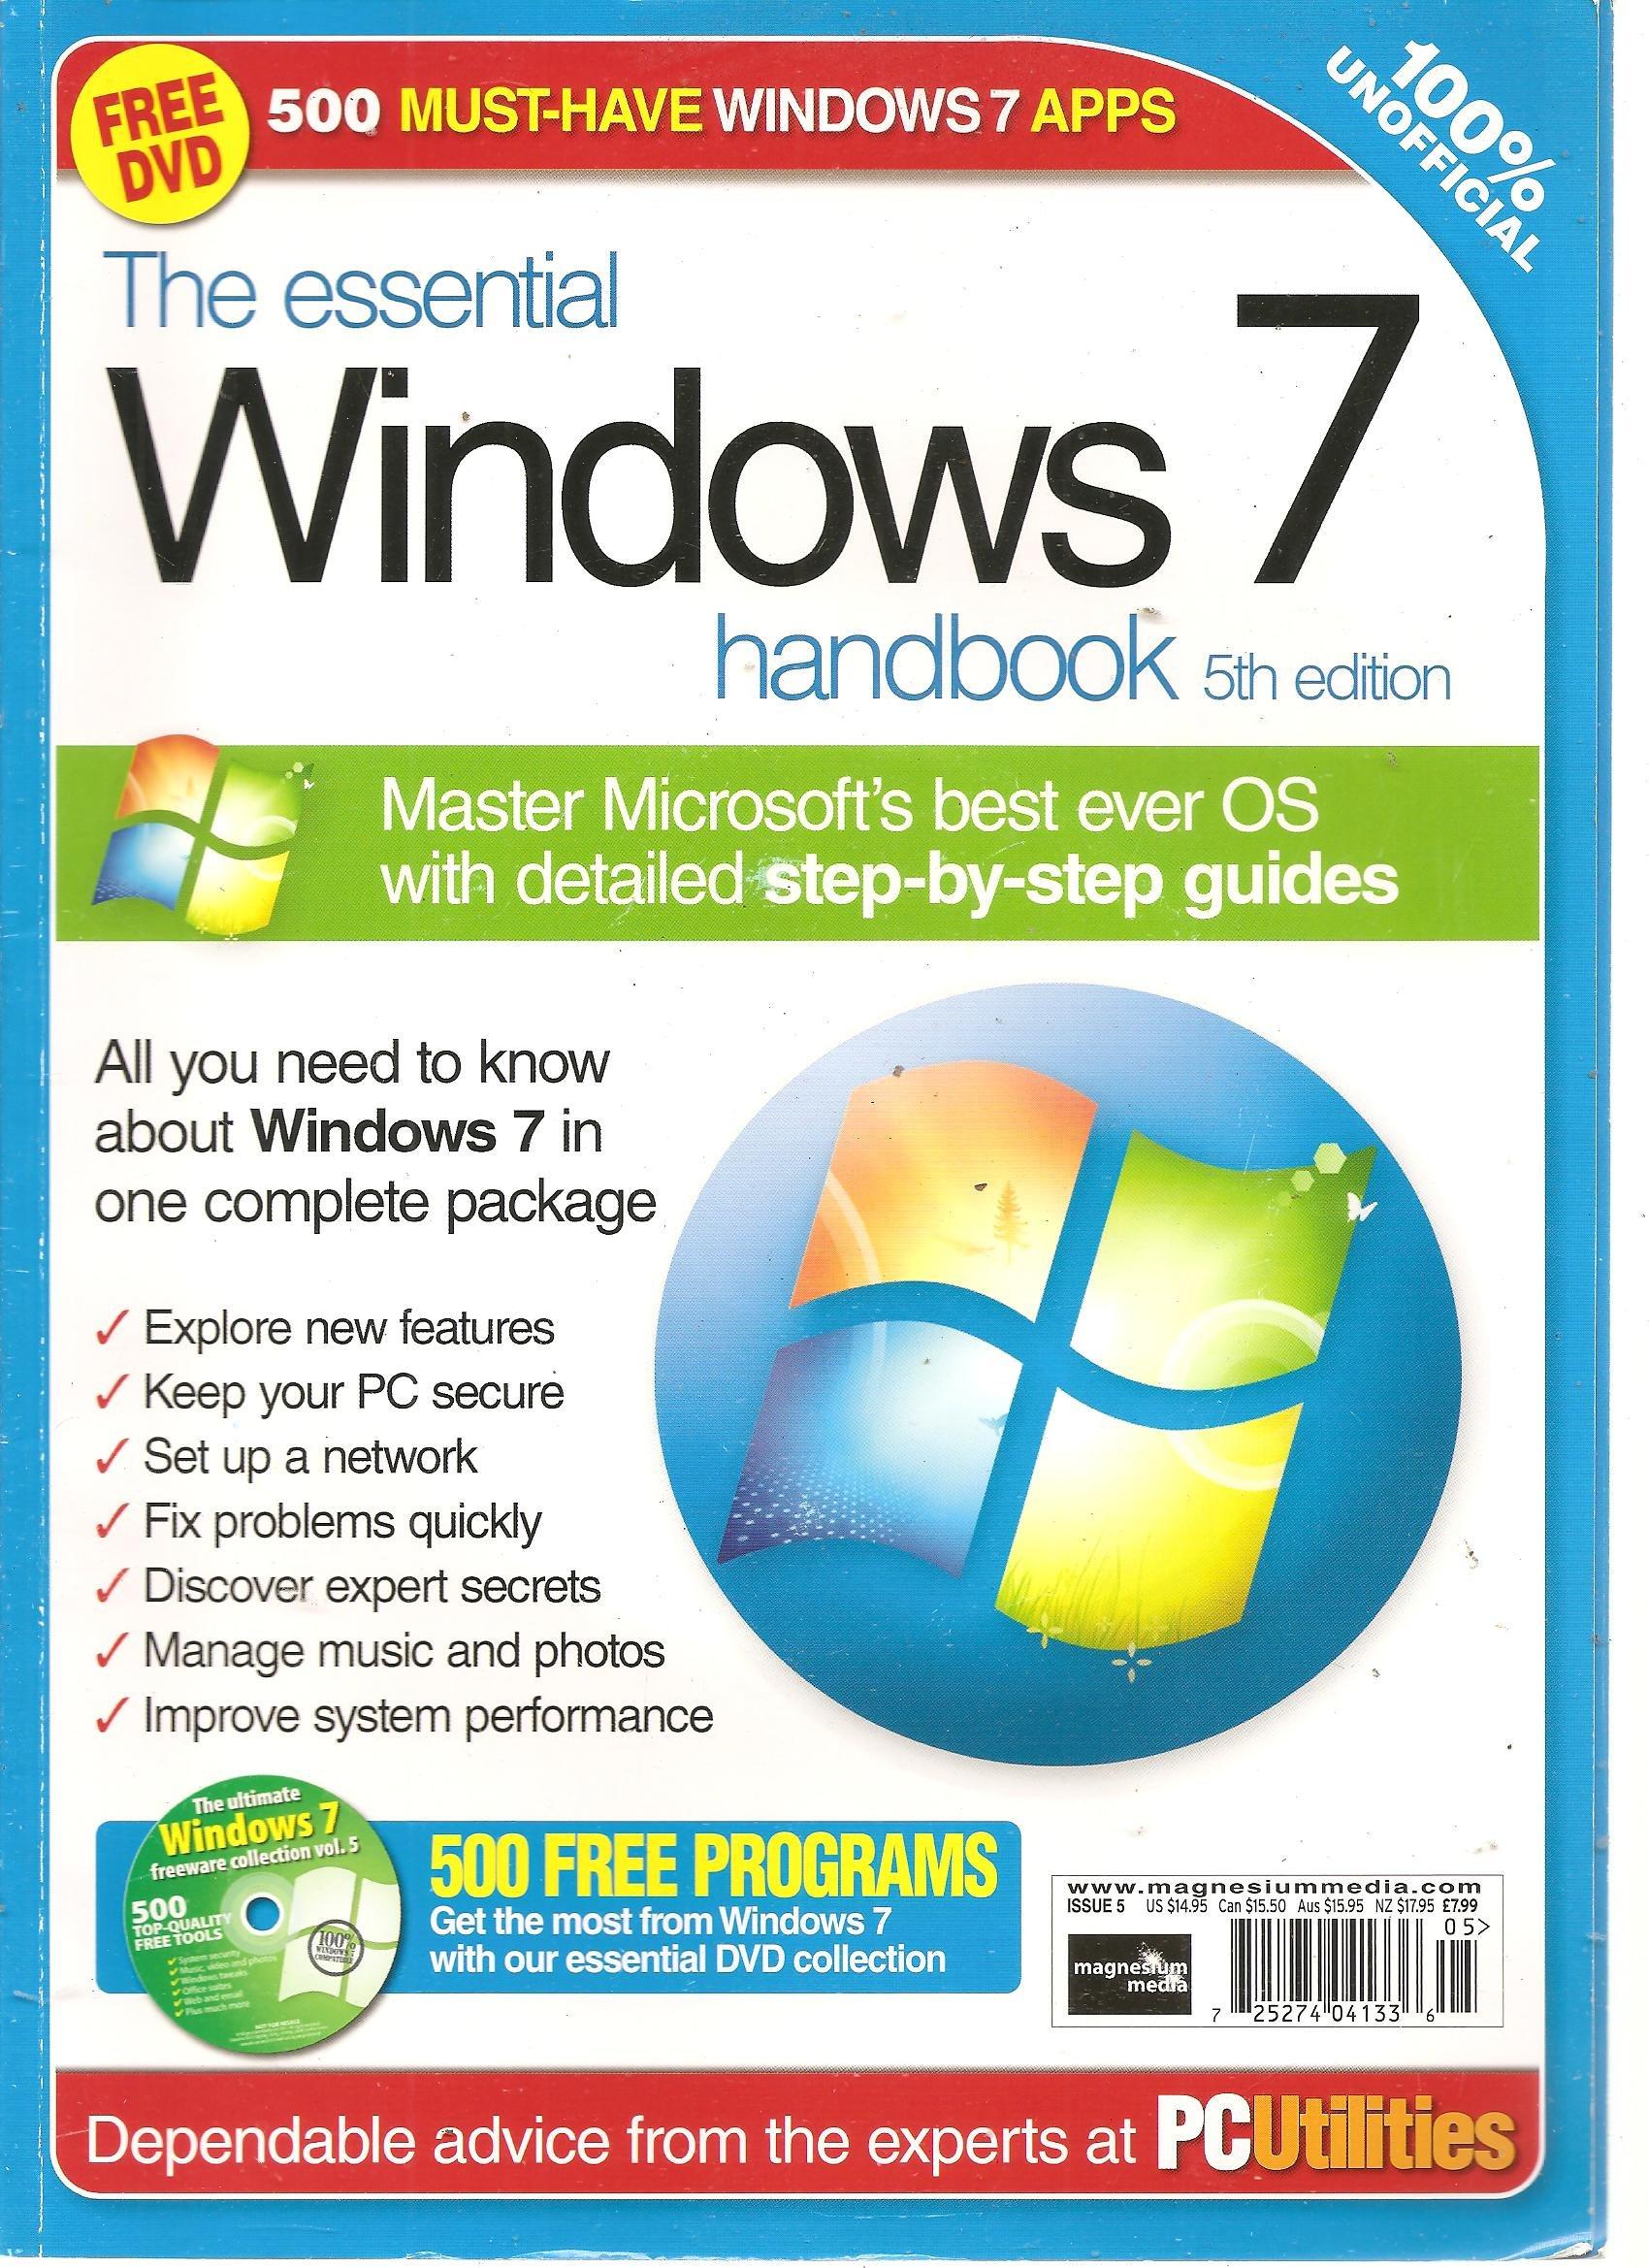 The Essential Windows 7 Handbook (500 must have windows 7